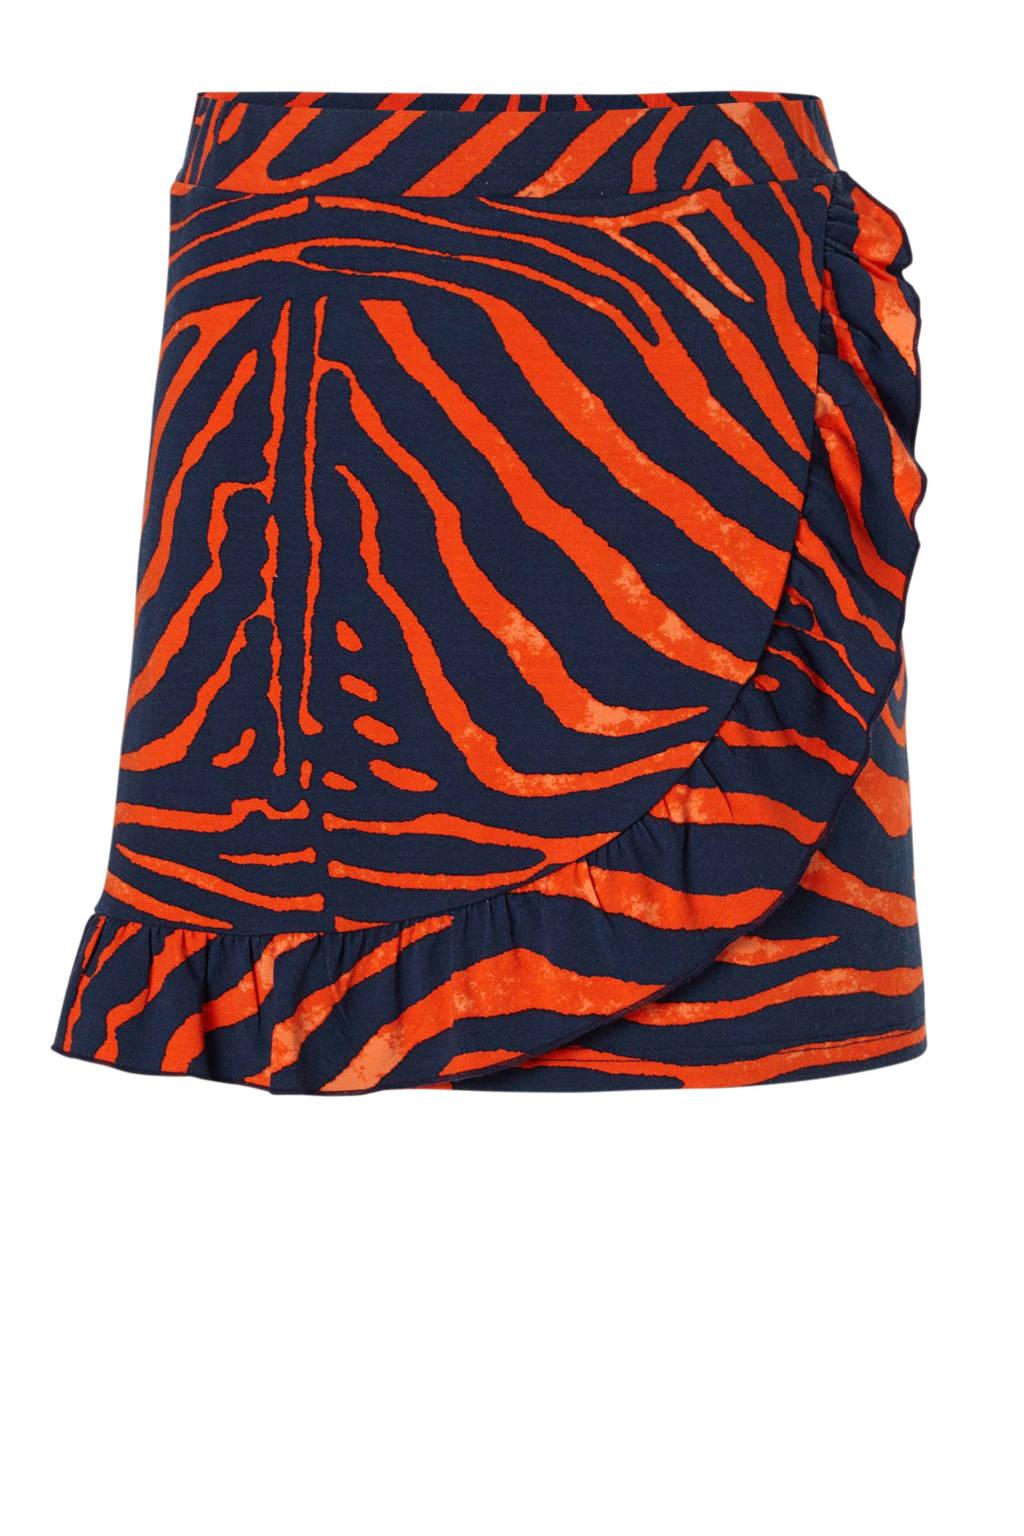 Geisha rok met zebraprint rood/donkerblauw, Rood/donkerblauw